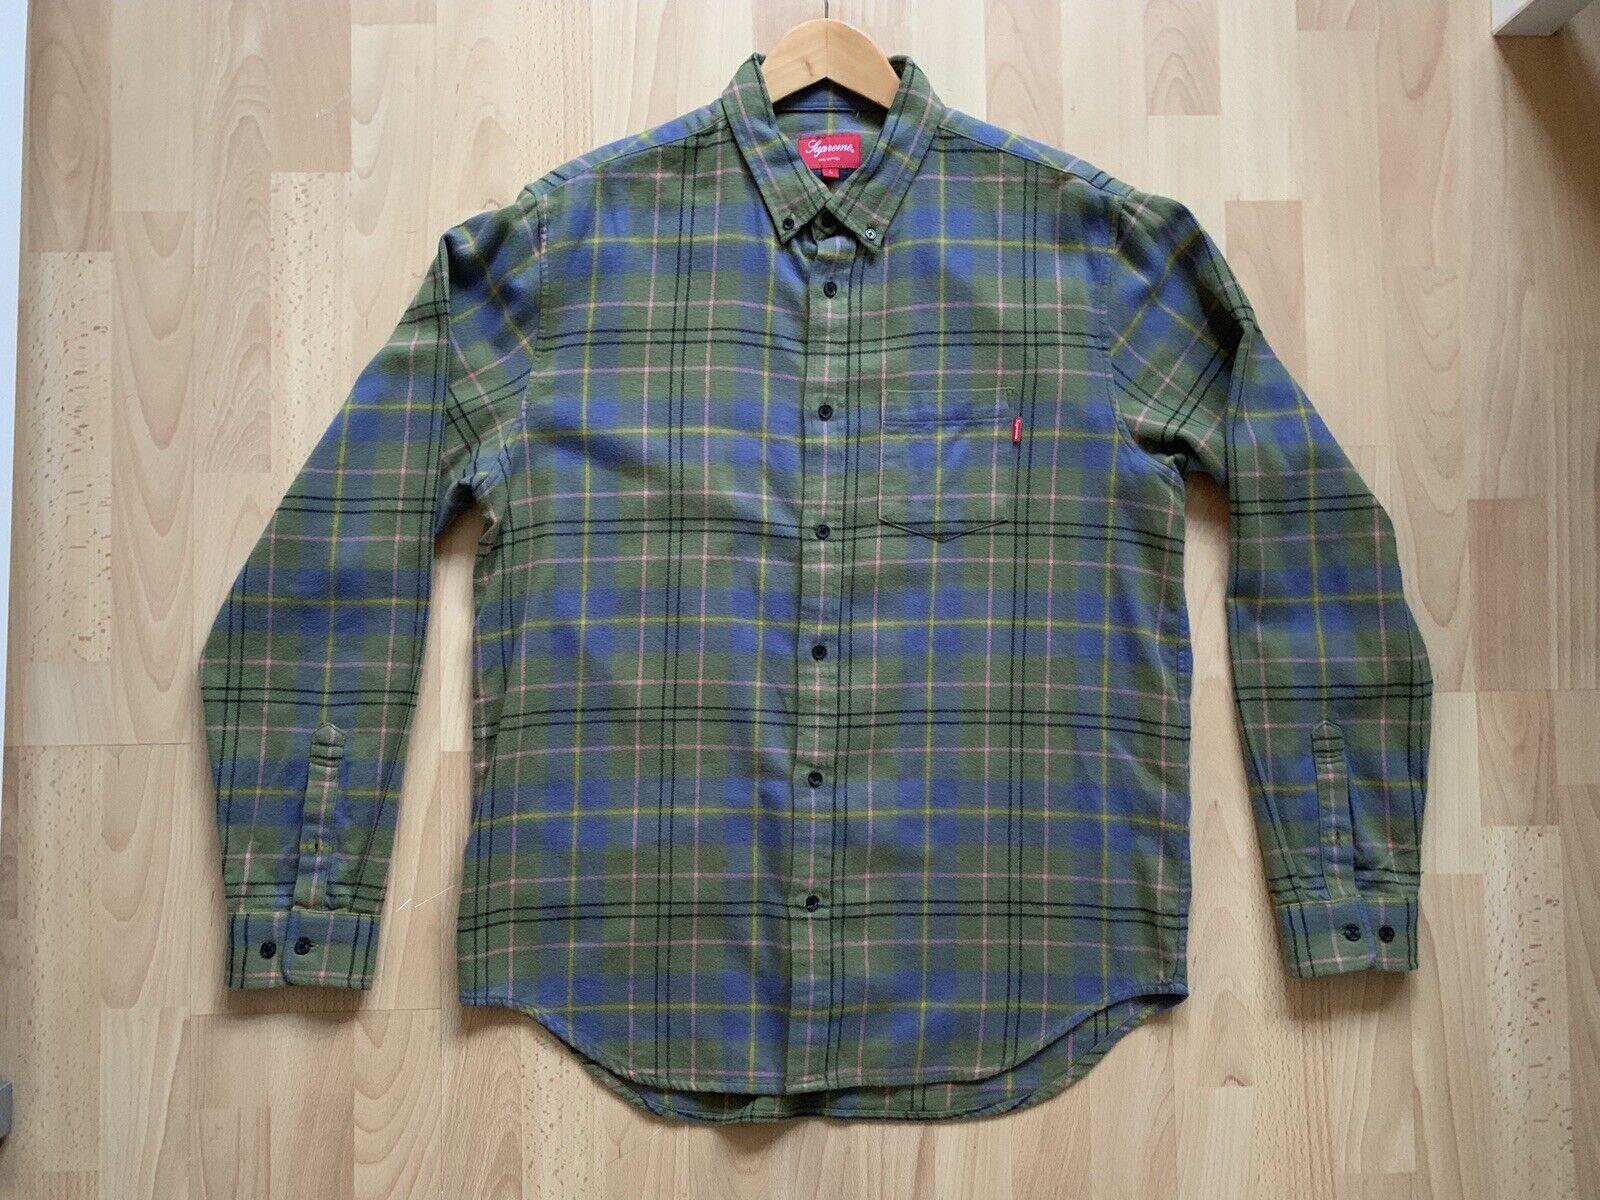 Supreme Light Olive Tartan Plaid Flannel Shirt - Large